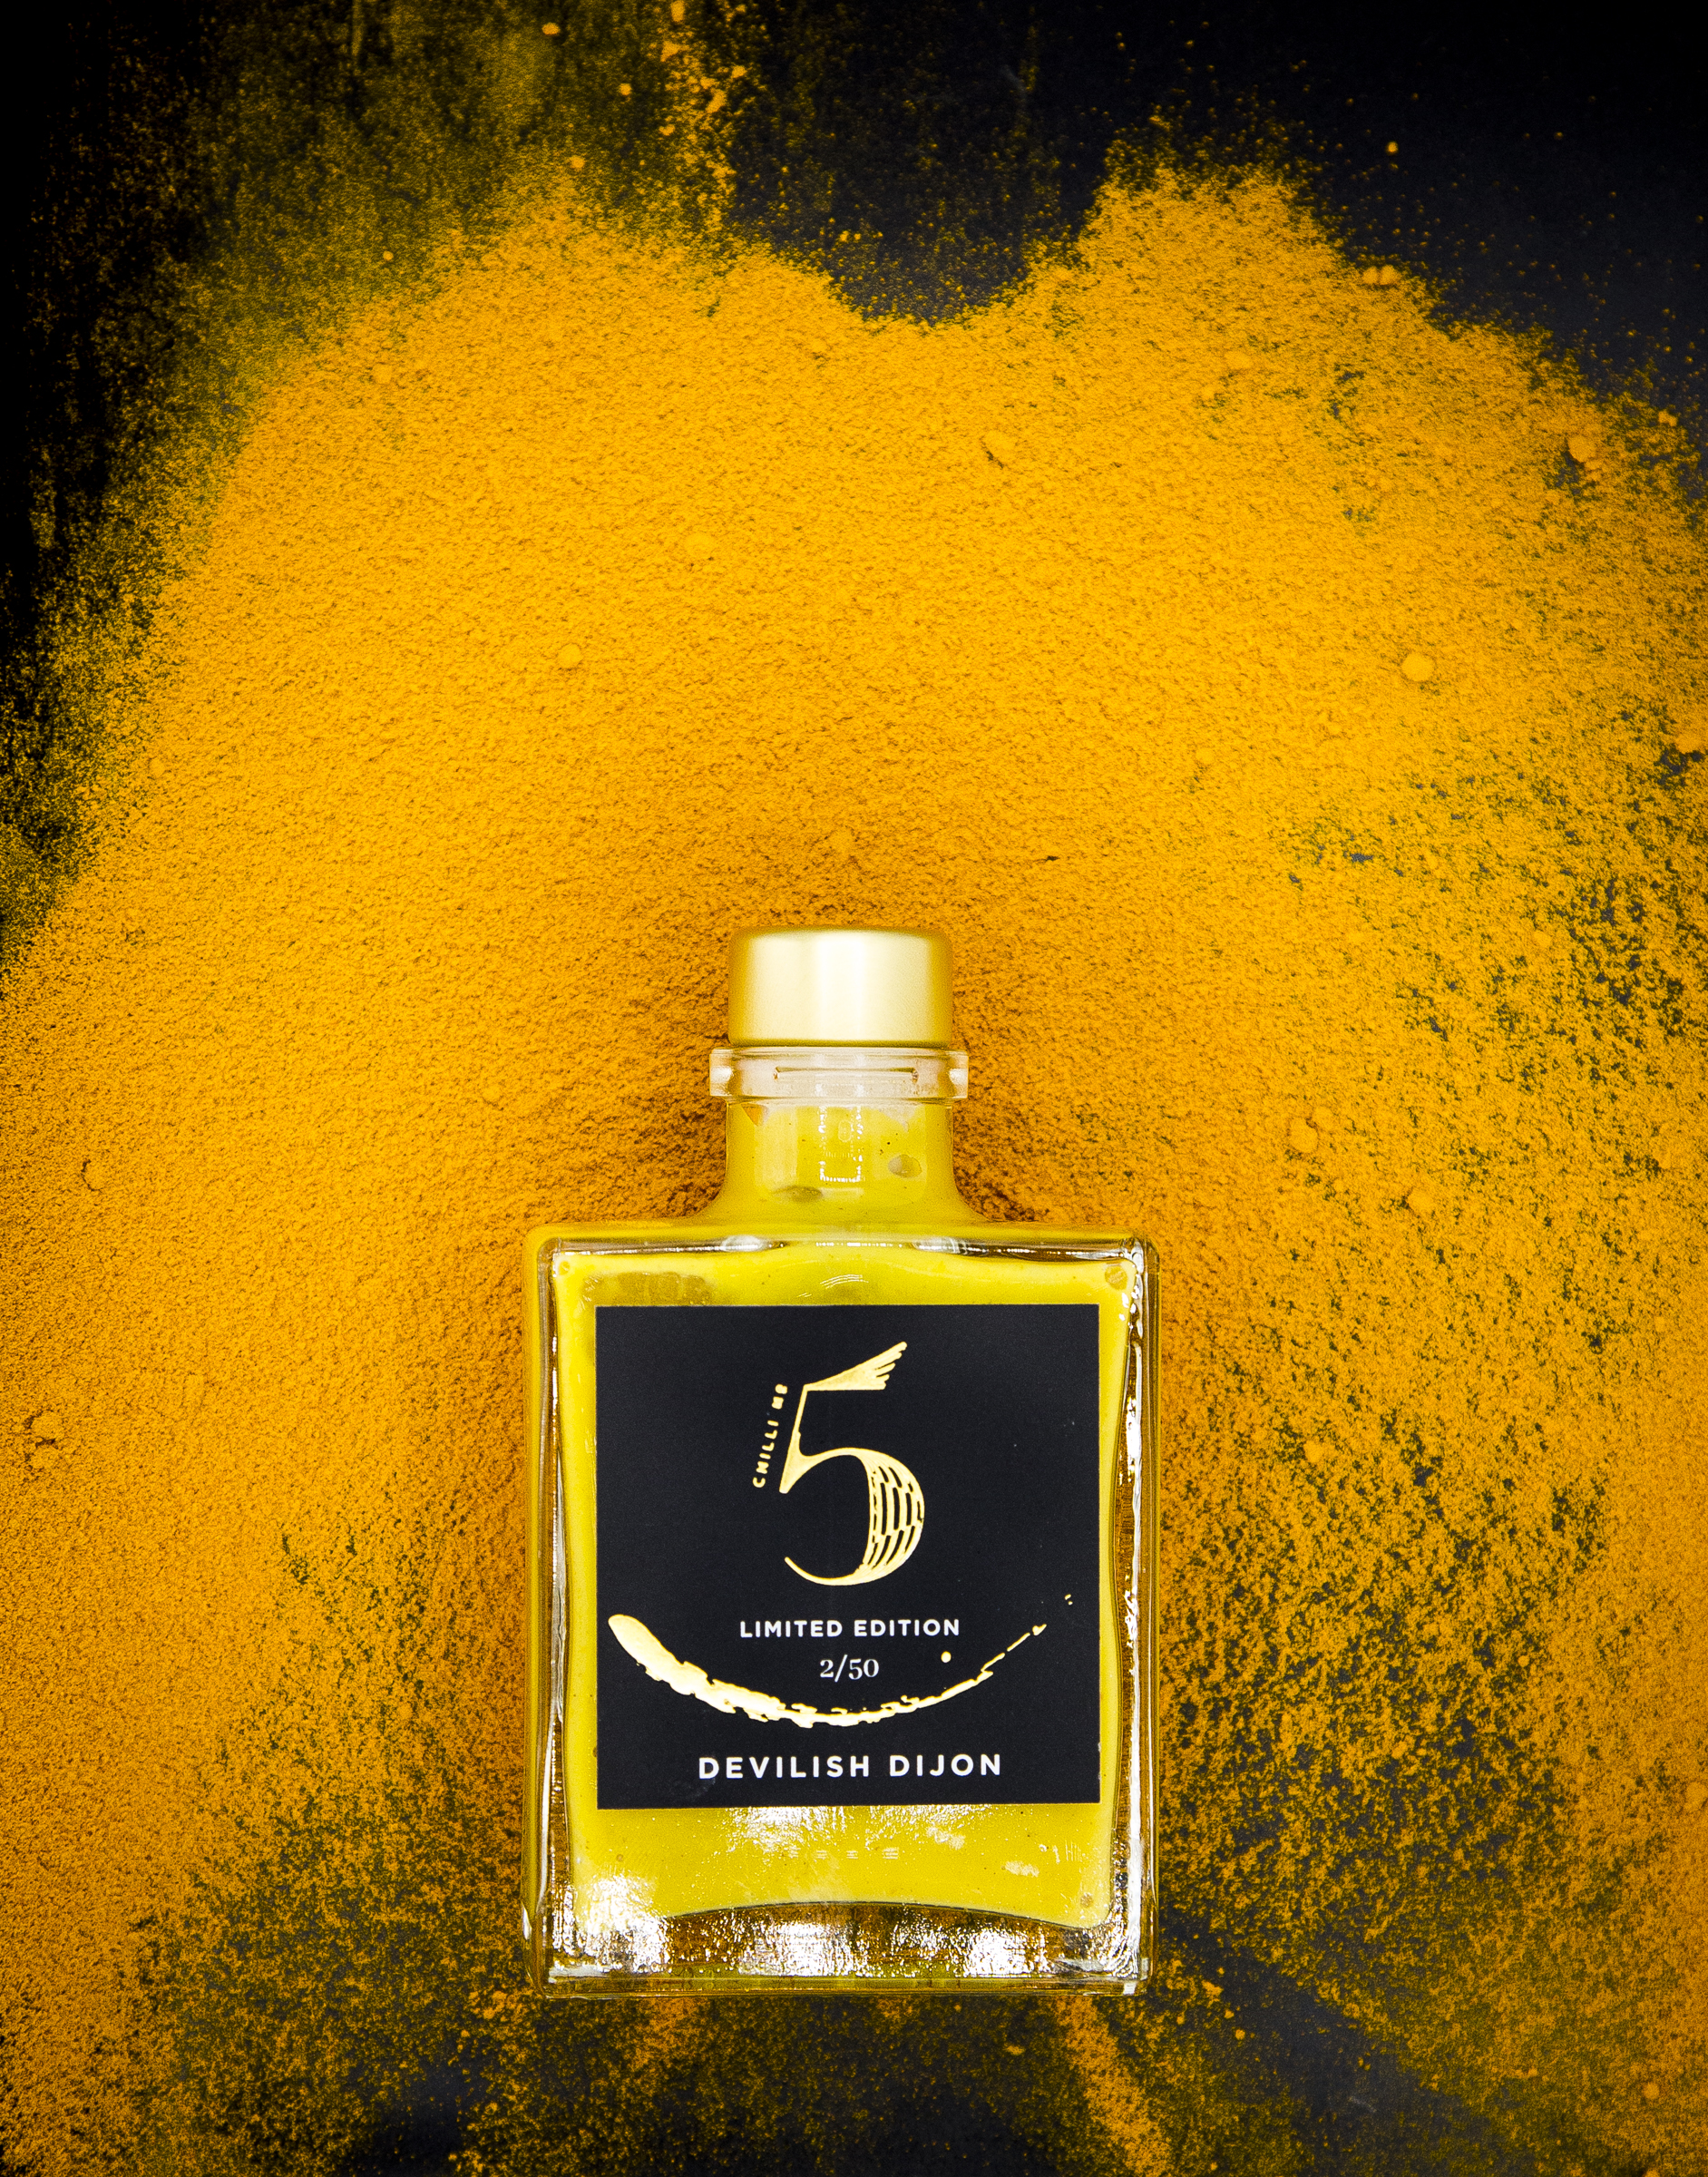 Best Spicy Dijon Mustard Sauce-Devilish Dijon-Spicy Hot Sauce Mustard